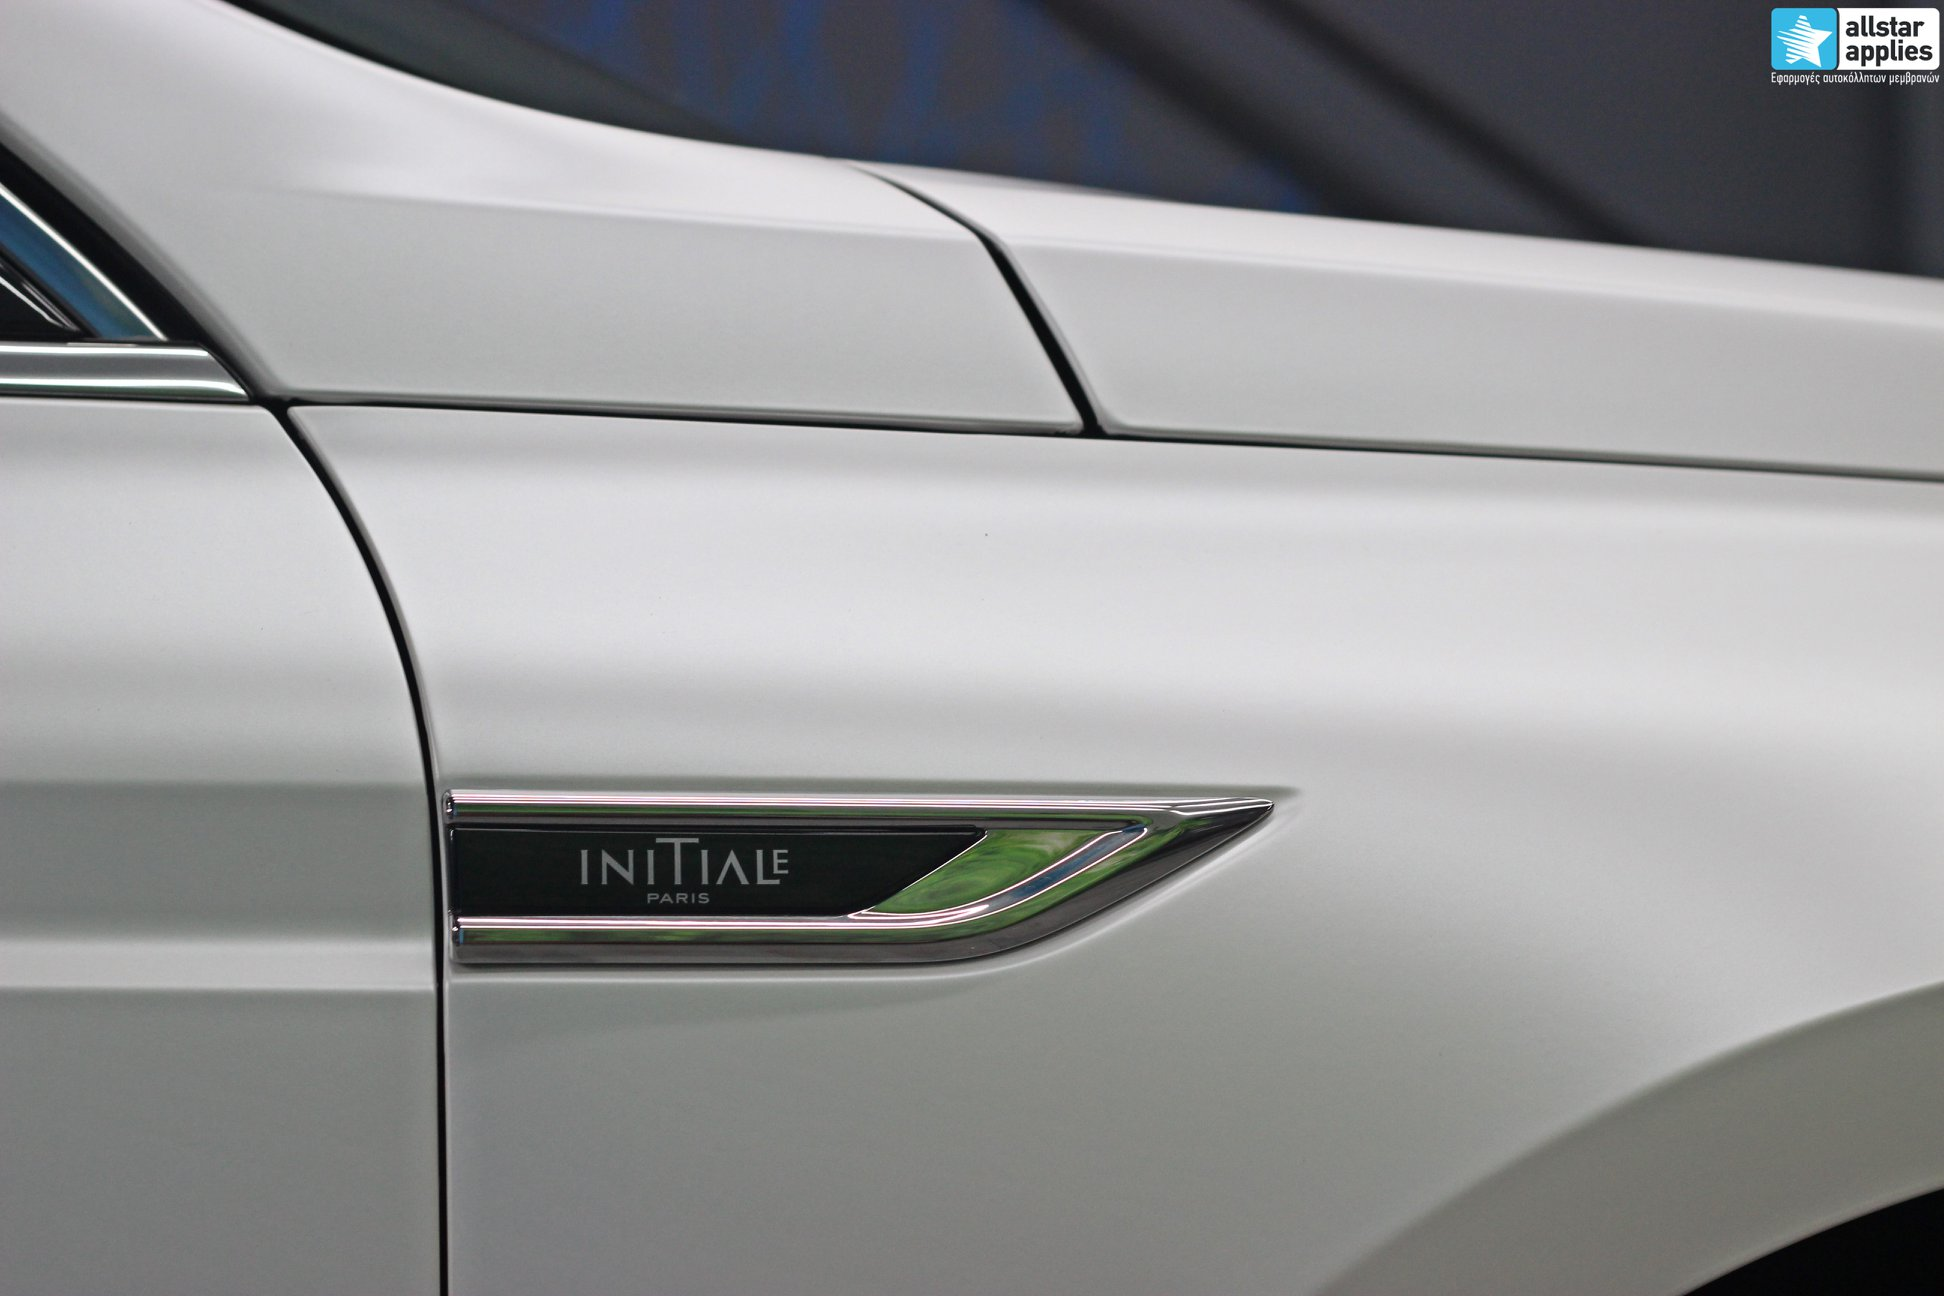 Renault Talisman - Satin Pearl White (6)